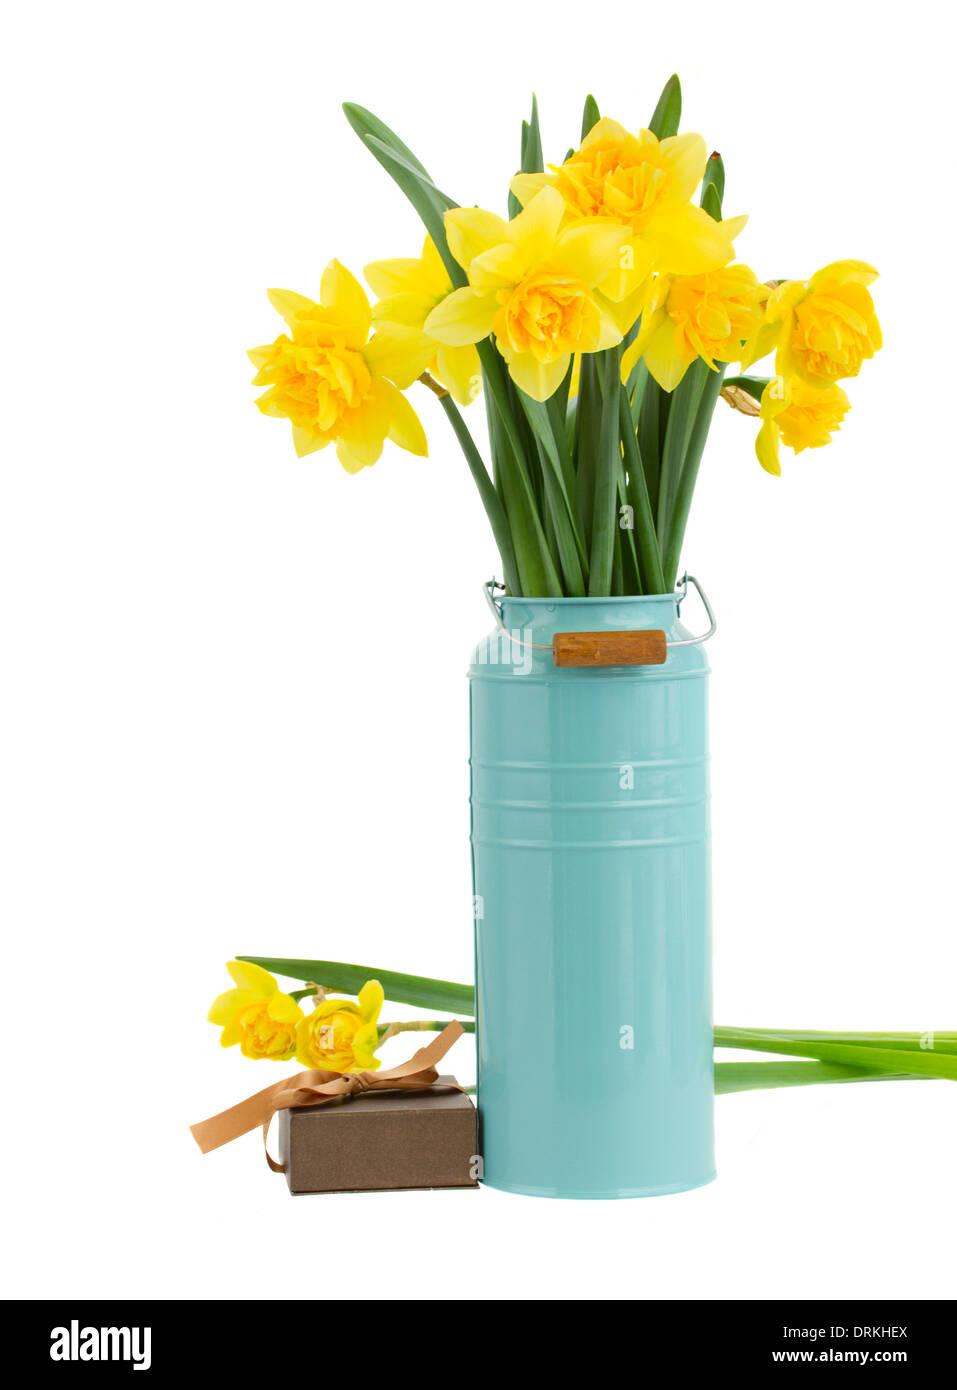 Daffodils In Vase Blue Stock Photos & Daffodils In Vase Blue Stock ...